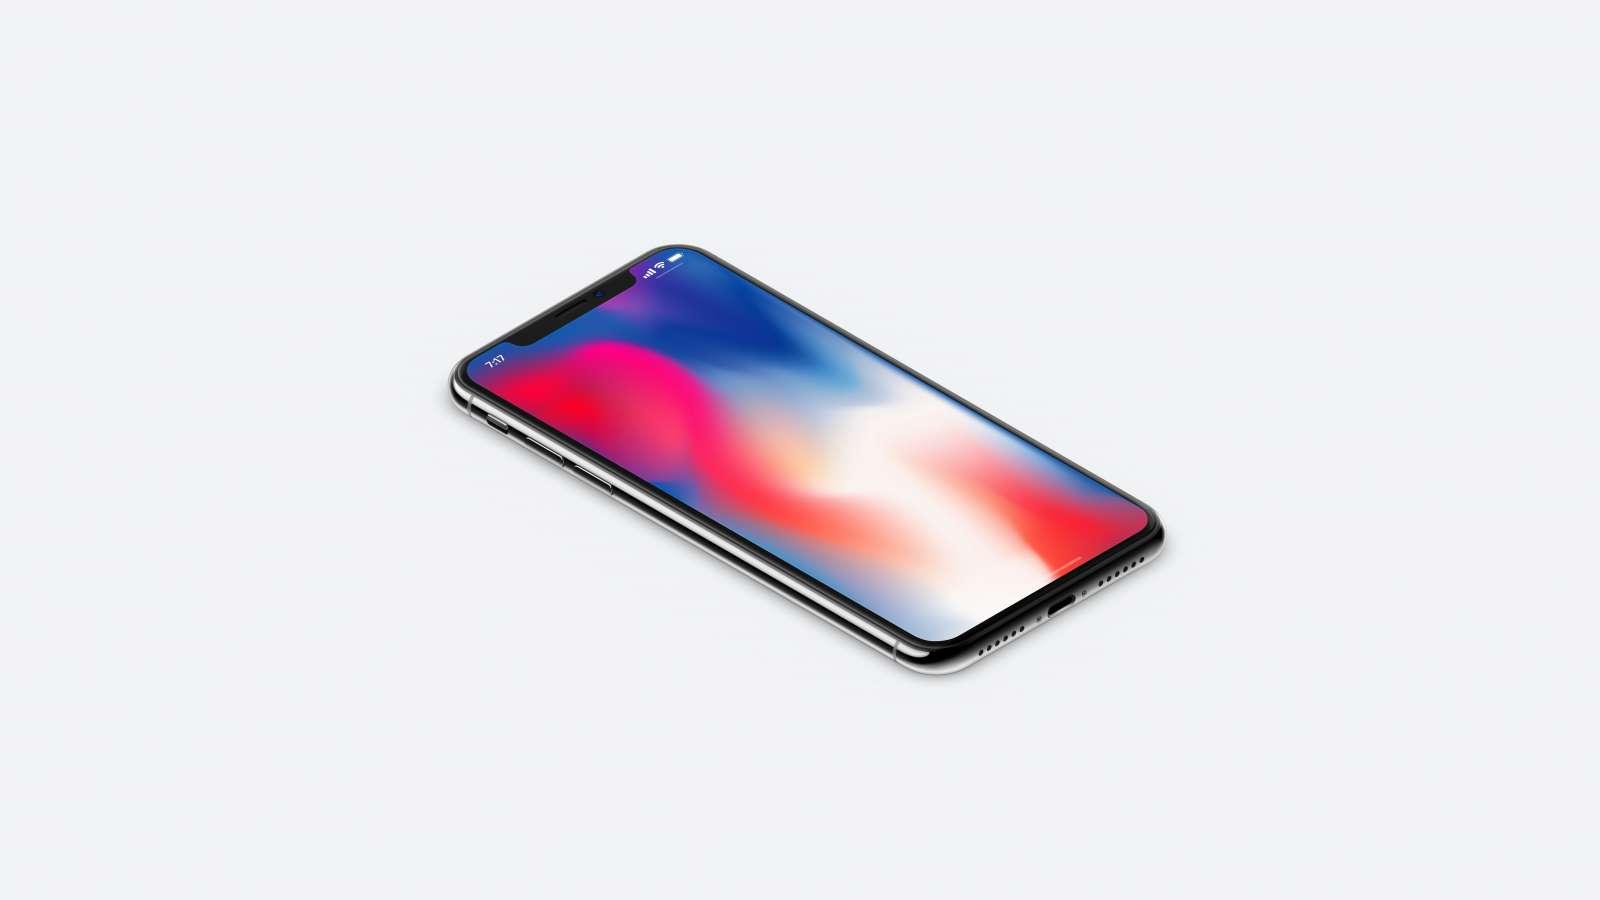 Apple Iphone X Live Wallpapers - Iphone 10 4k - HD Wallpaper